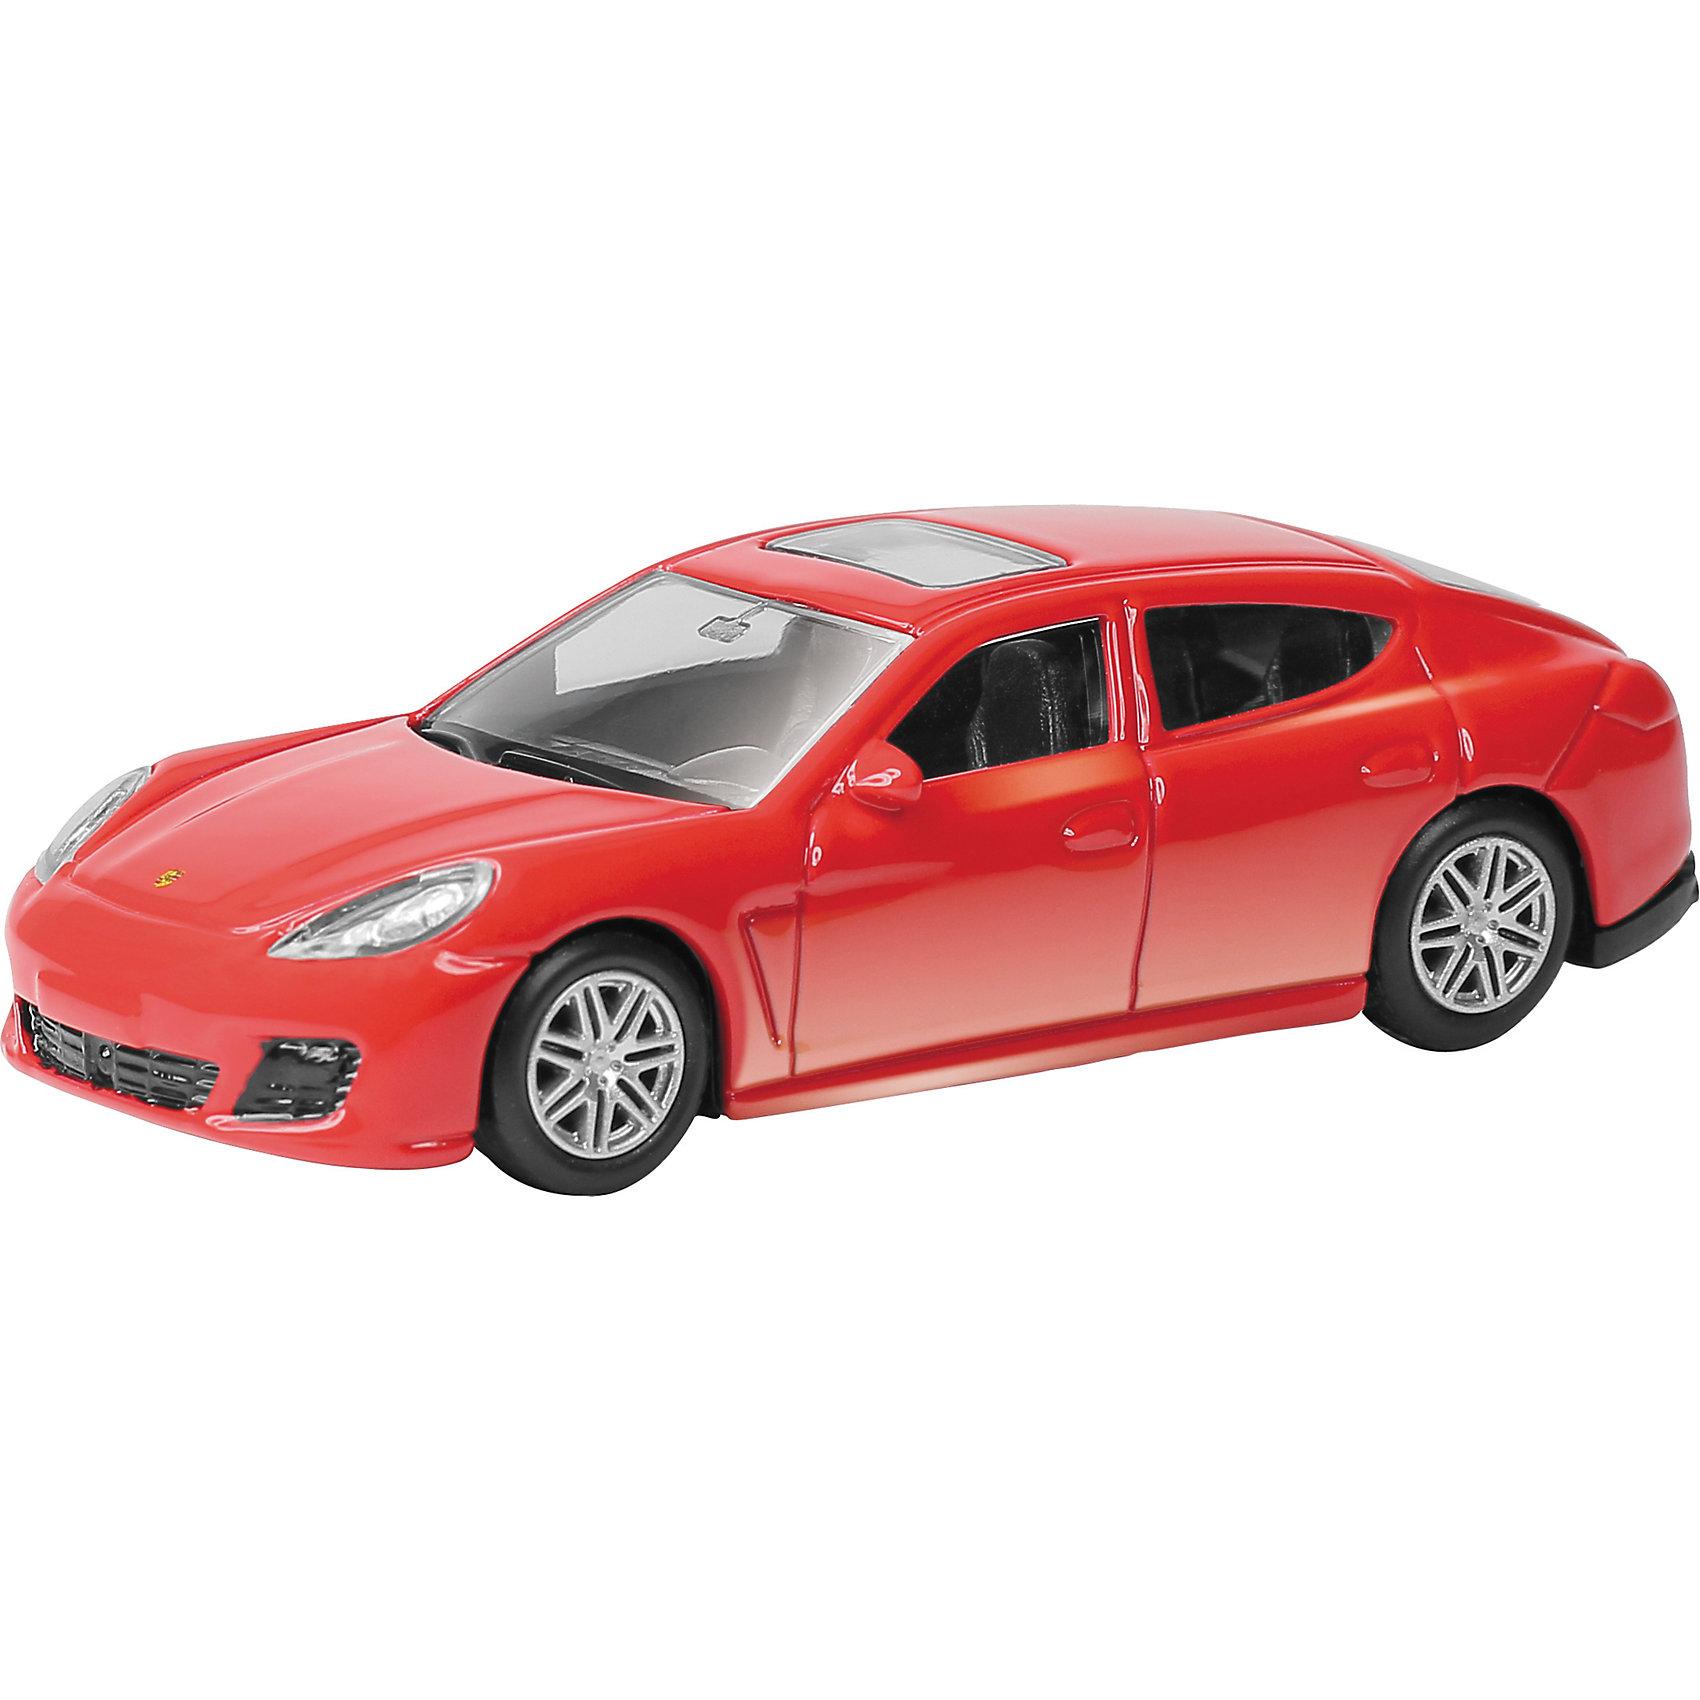 Машинка Porsche Panamera Turbo 3, AutotimeМашинки<br><br><br>Ширина мм: 90<br>Глубина мм: 42<br>Высота мм: 40<br>Вес г: 13<br>Возраст от месяцев: 36<br>Возраст до месяцев: 2147483647<br>Пол: Мужской<br>Возраст: Детский<br>SKU: 5584086